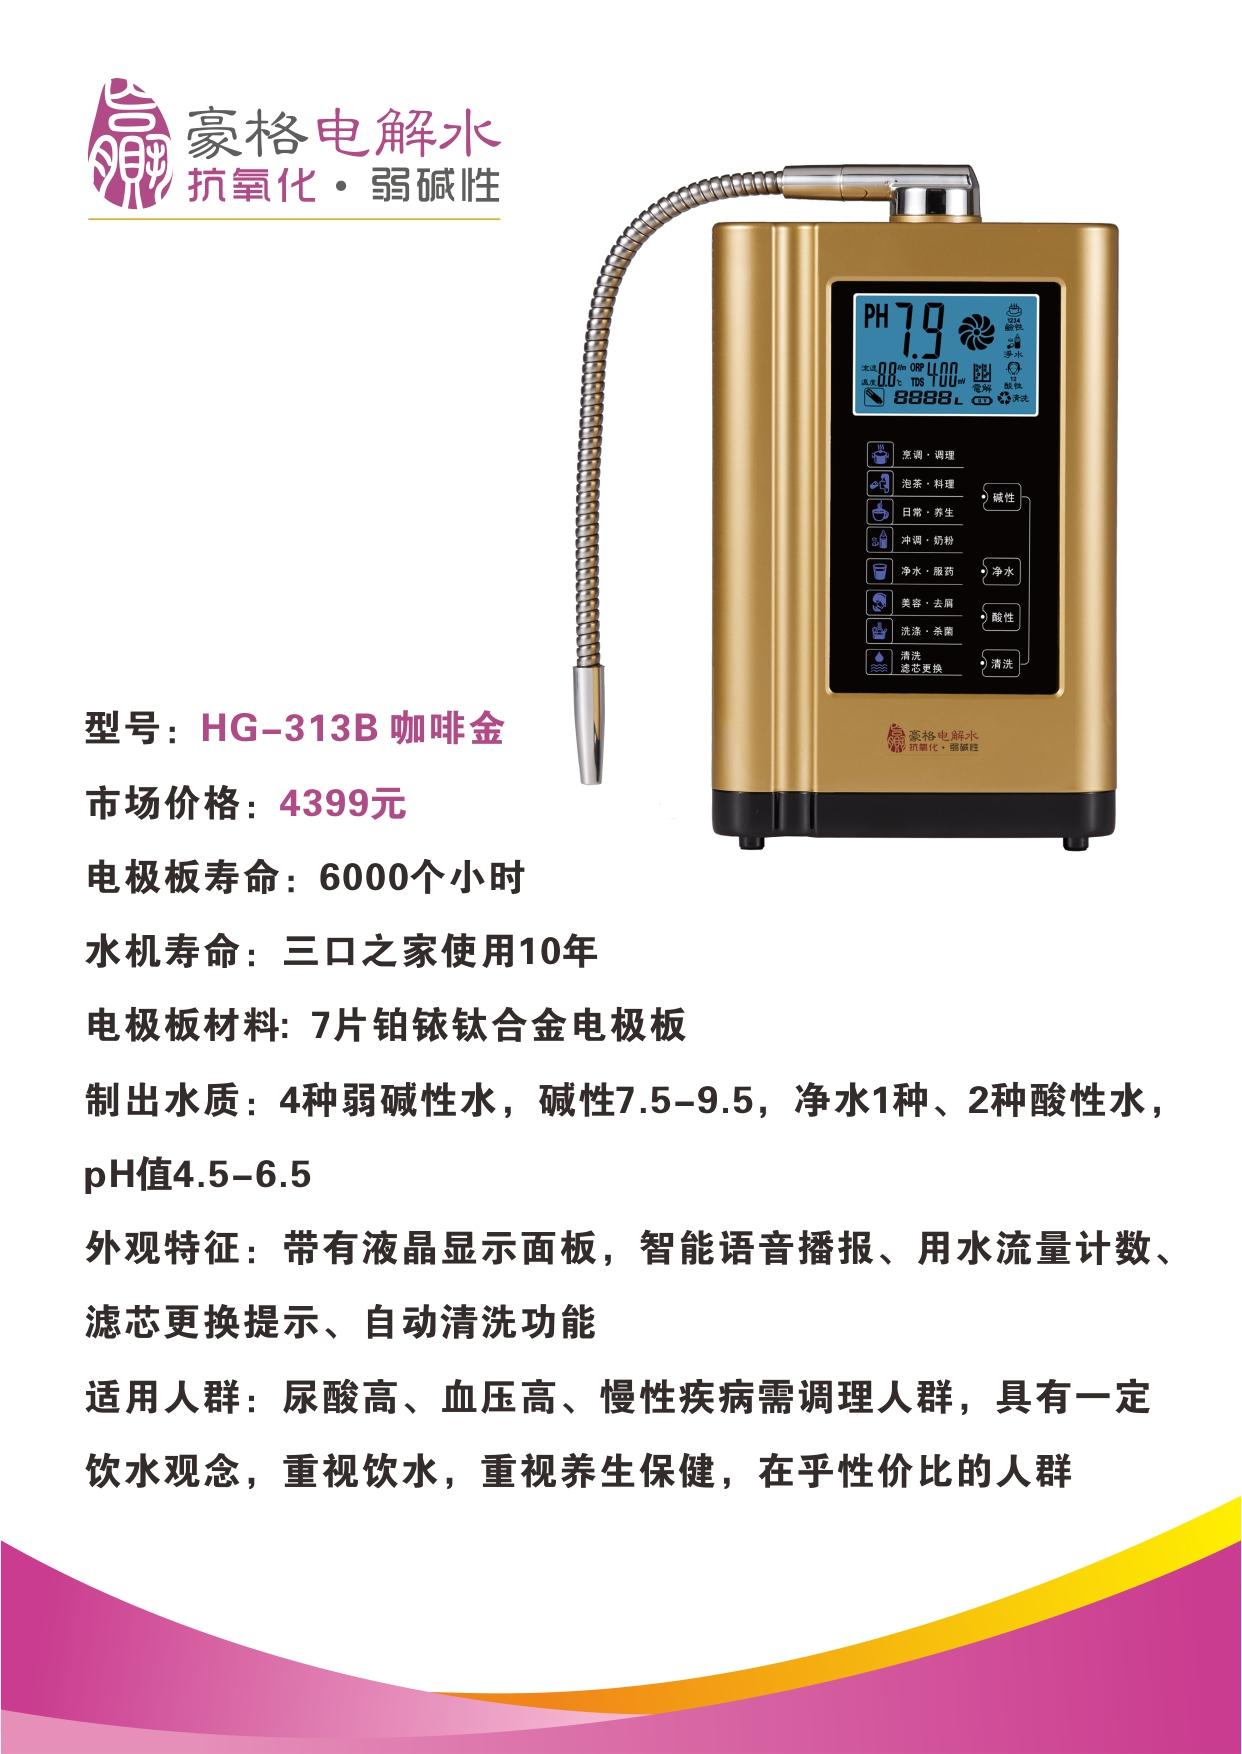 HG-313B 咖啡金.jpg